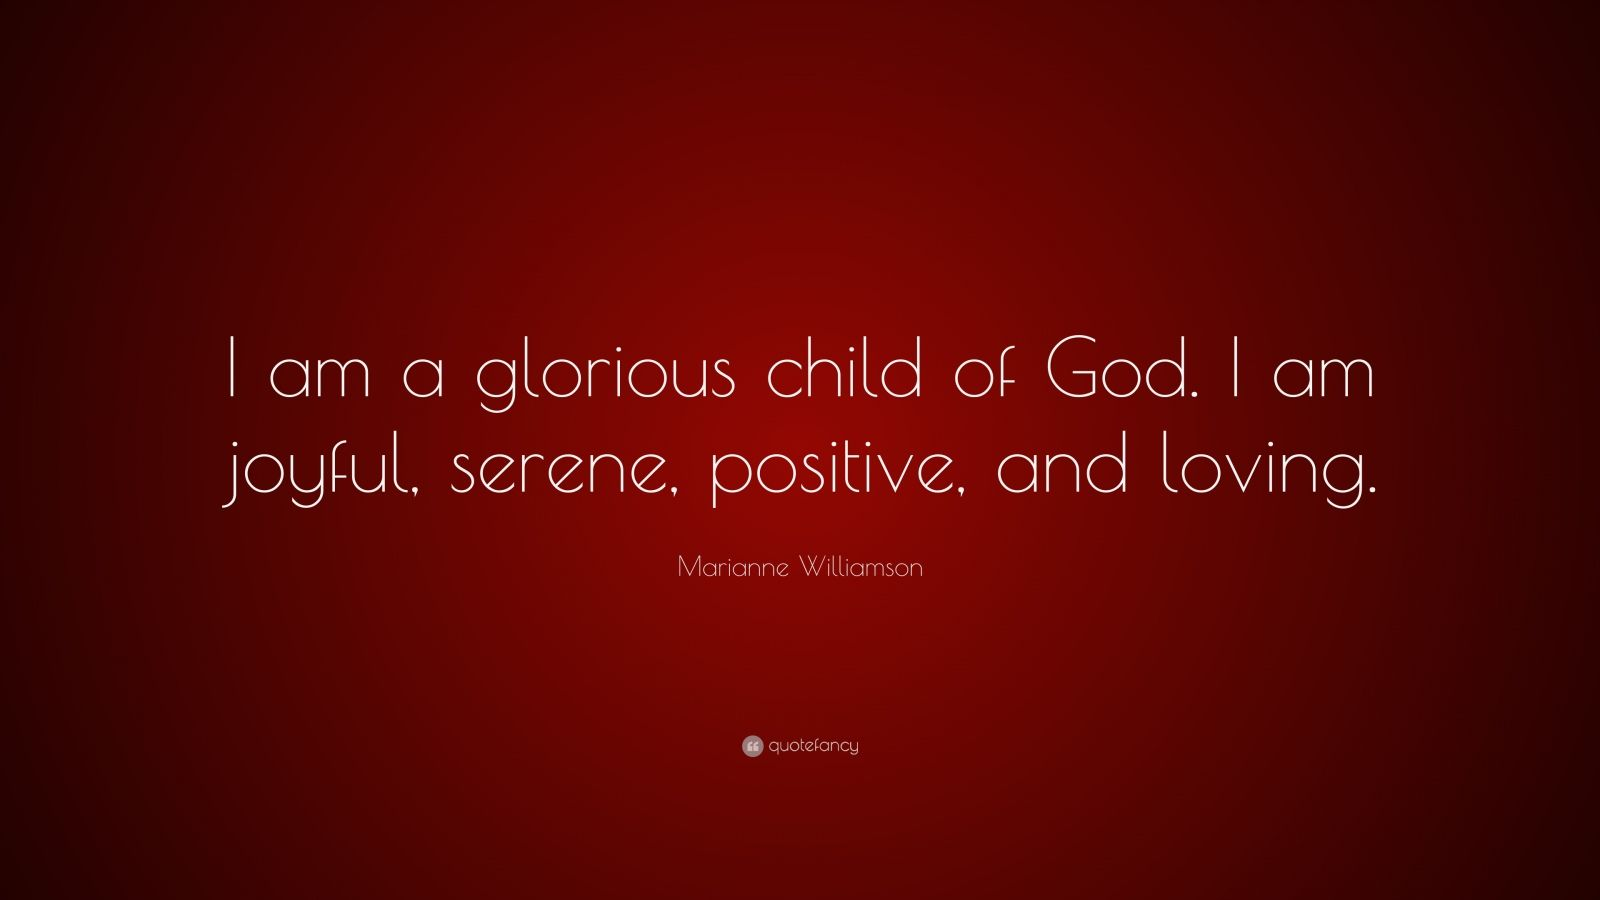 "Marianne Williamson Quote: ""I am a glorious child of God. I am joyful, serene, positive, and loving."""